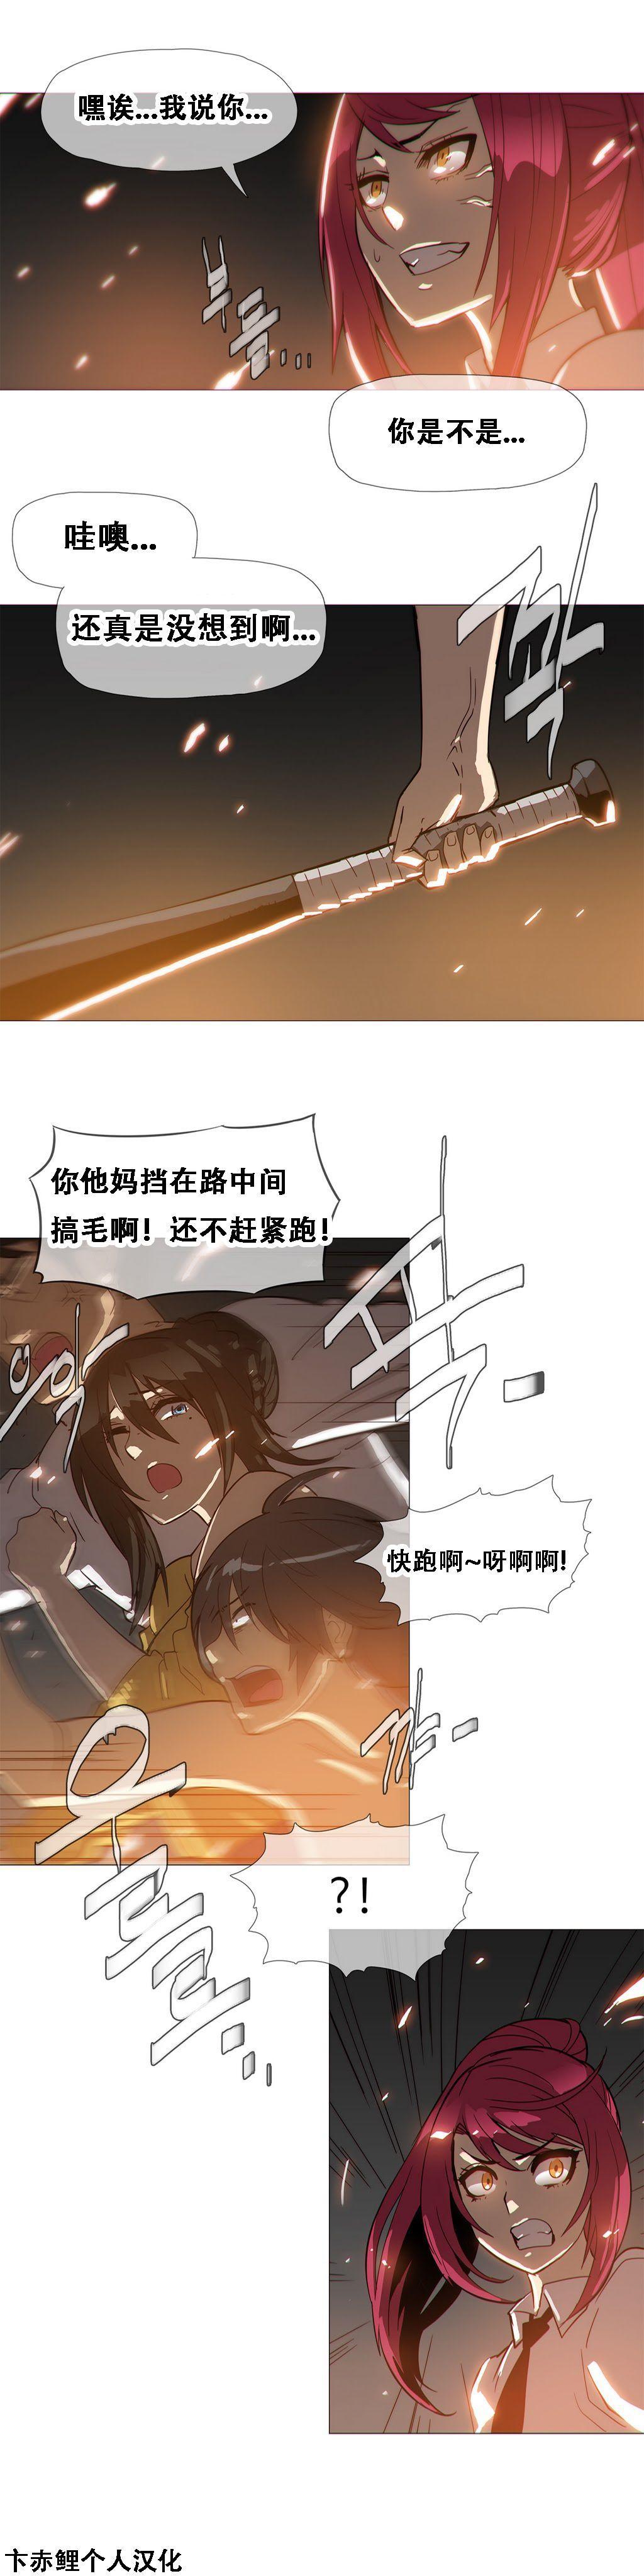 HouseHold Affairs 【卞赤鲤个人汉化】1~33话(持续更新中) 378